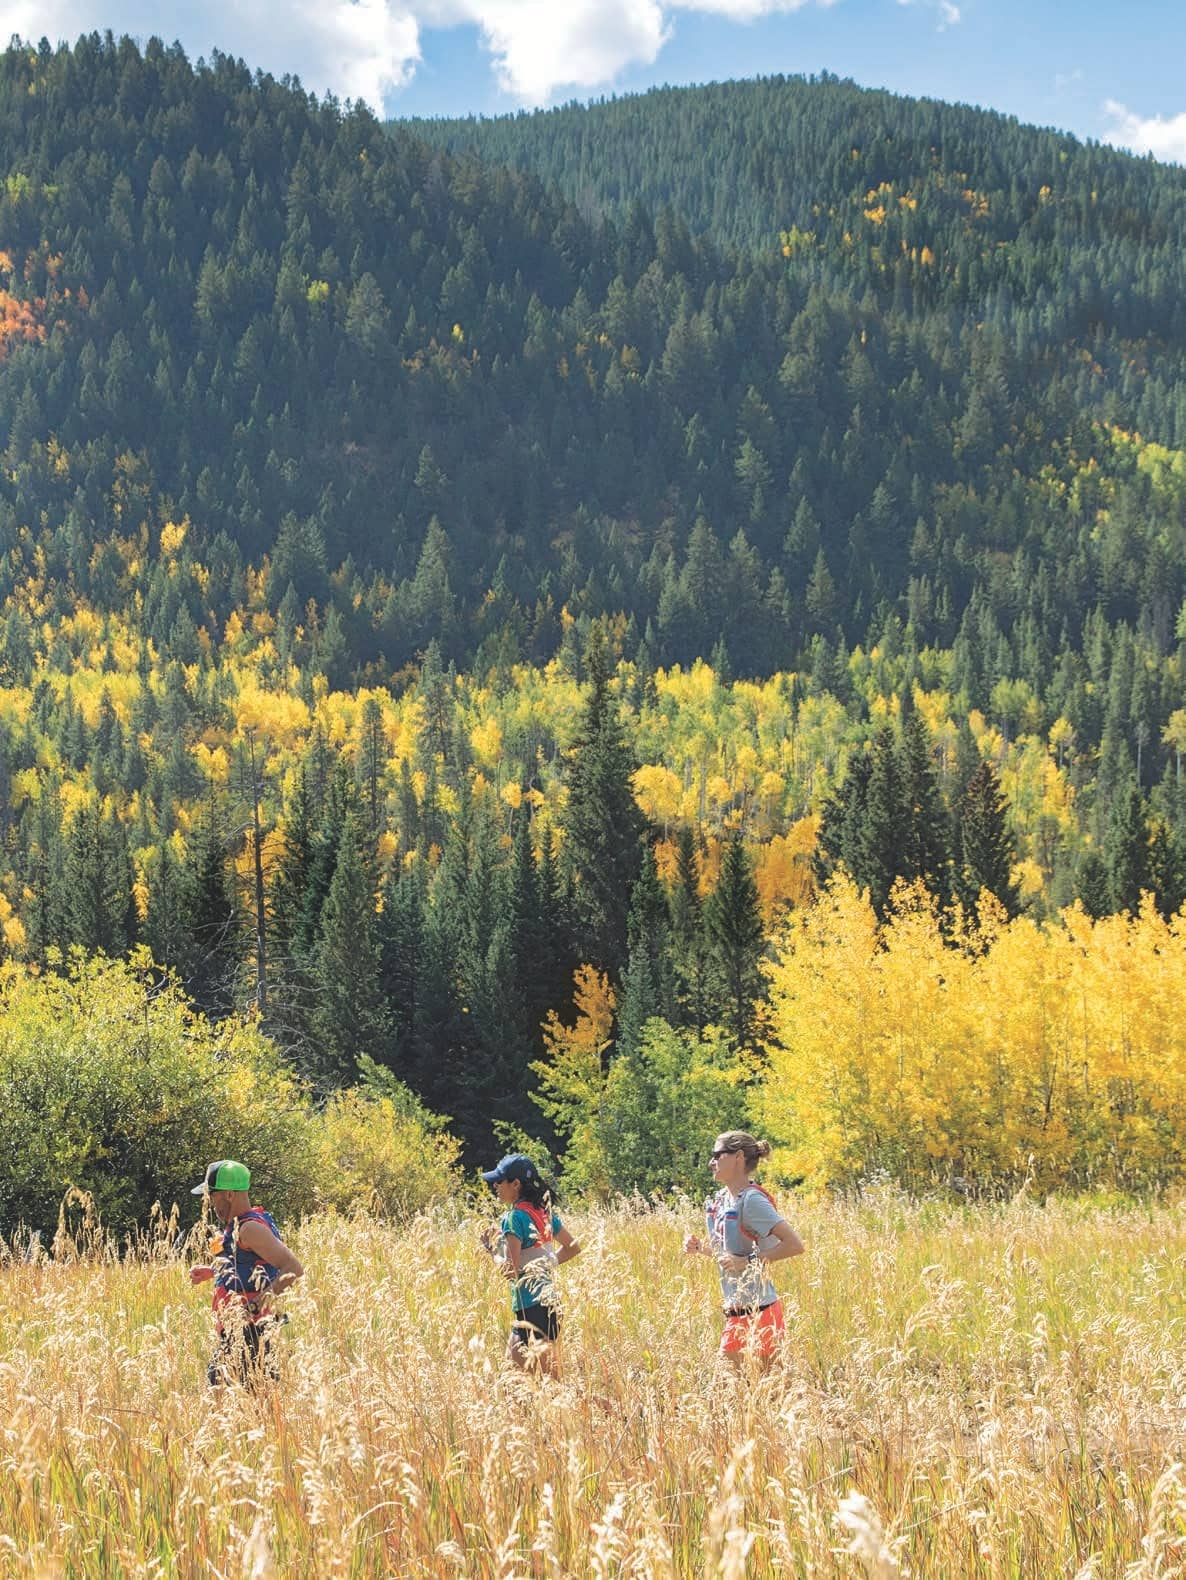 Colorado Rockies - The Run Of Your Life